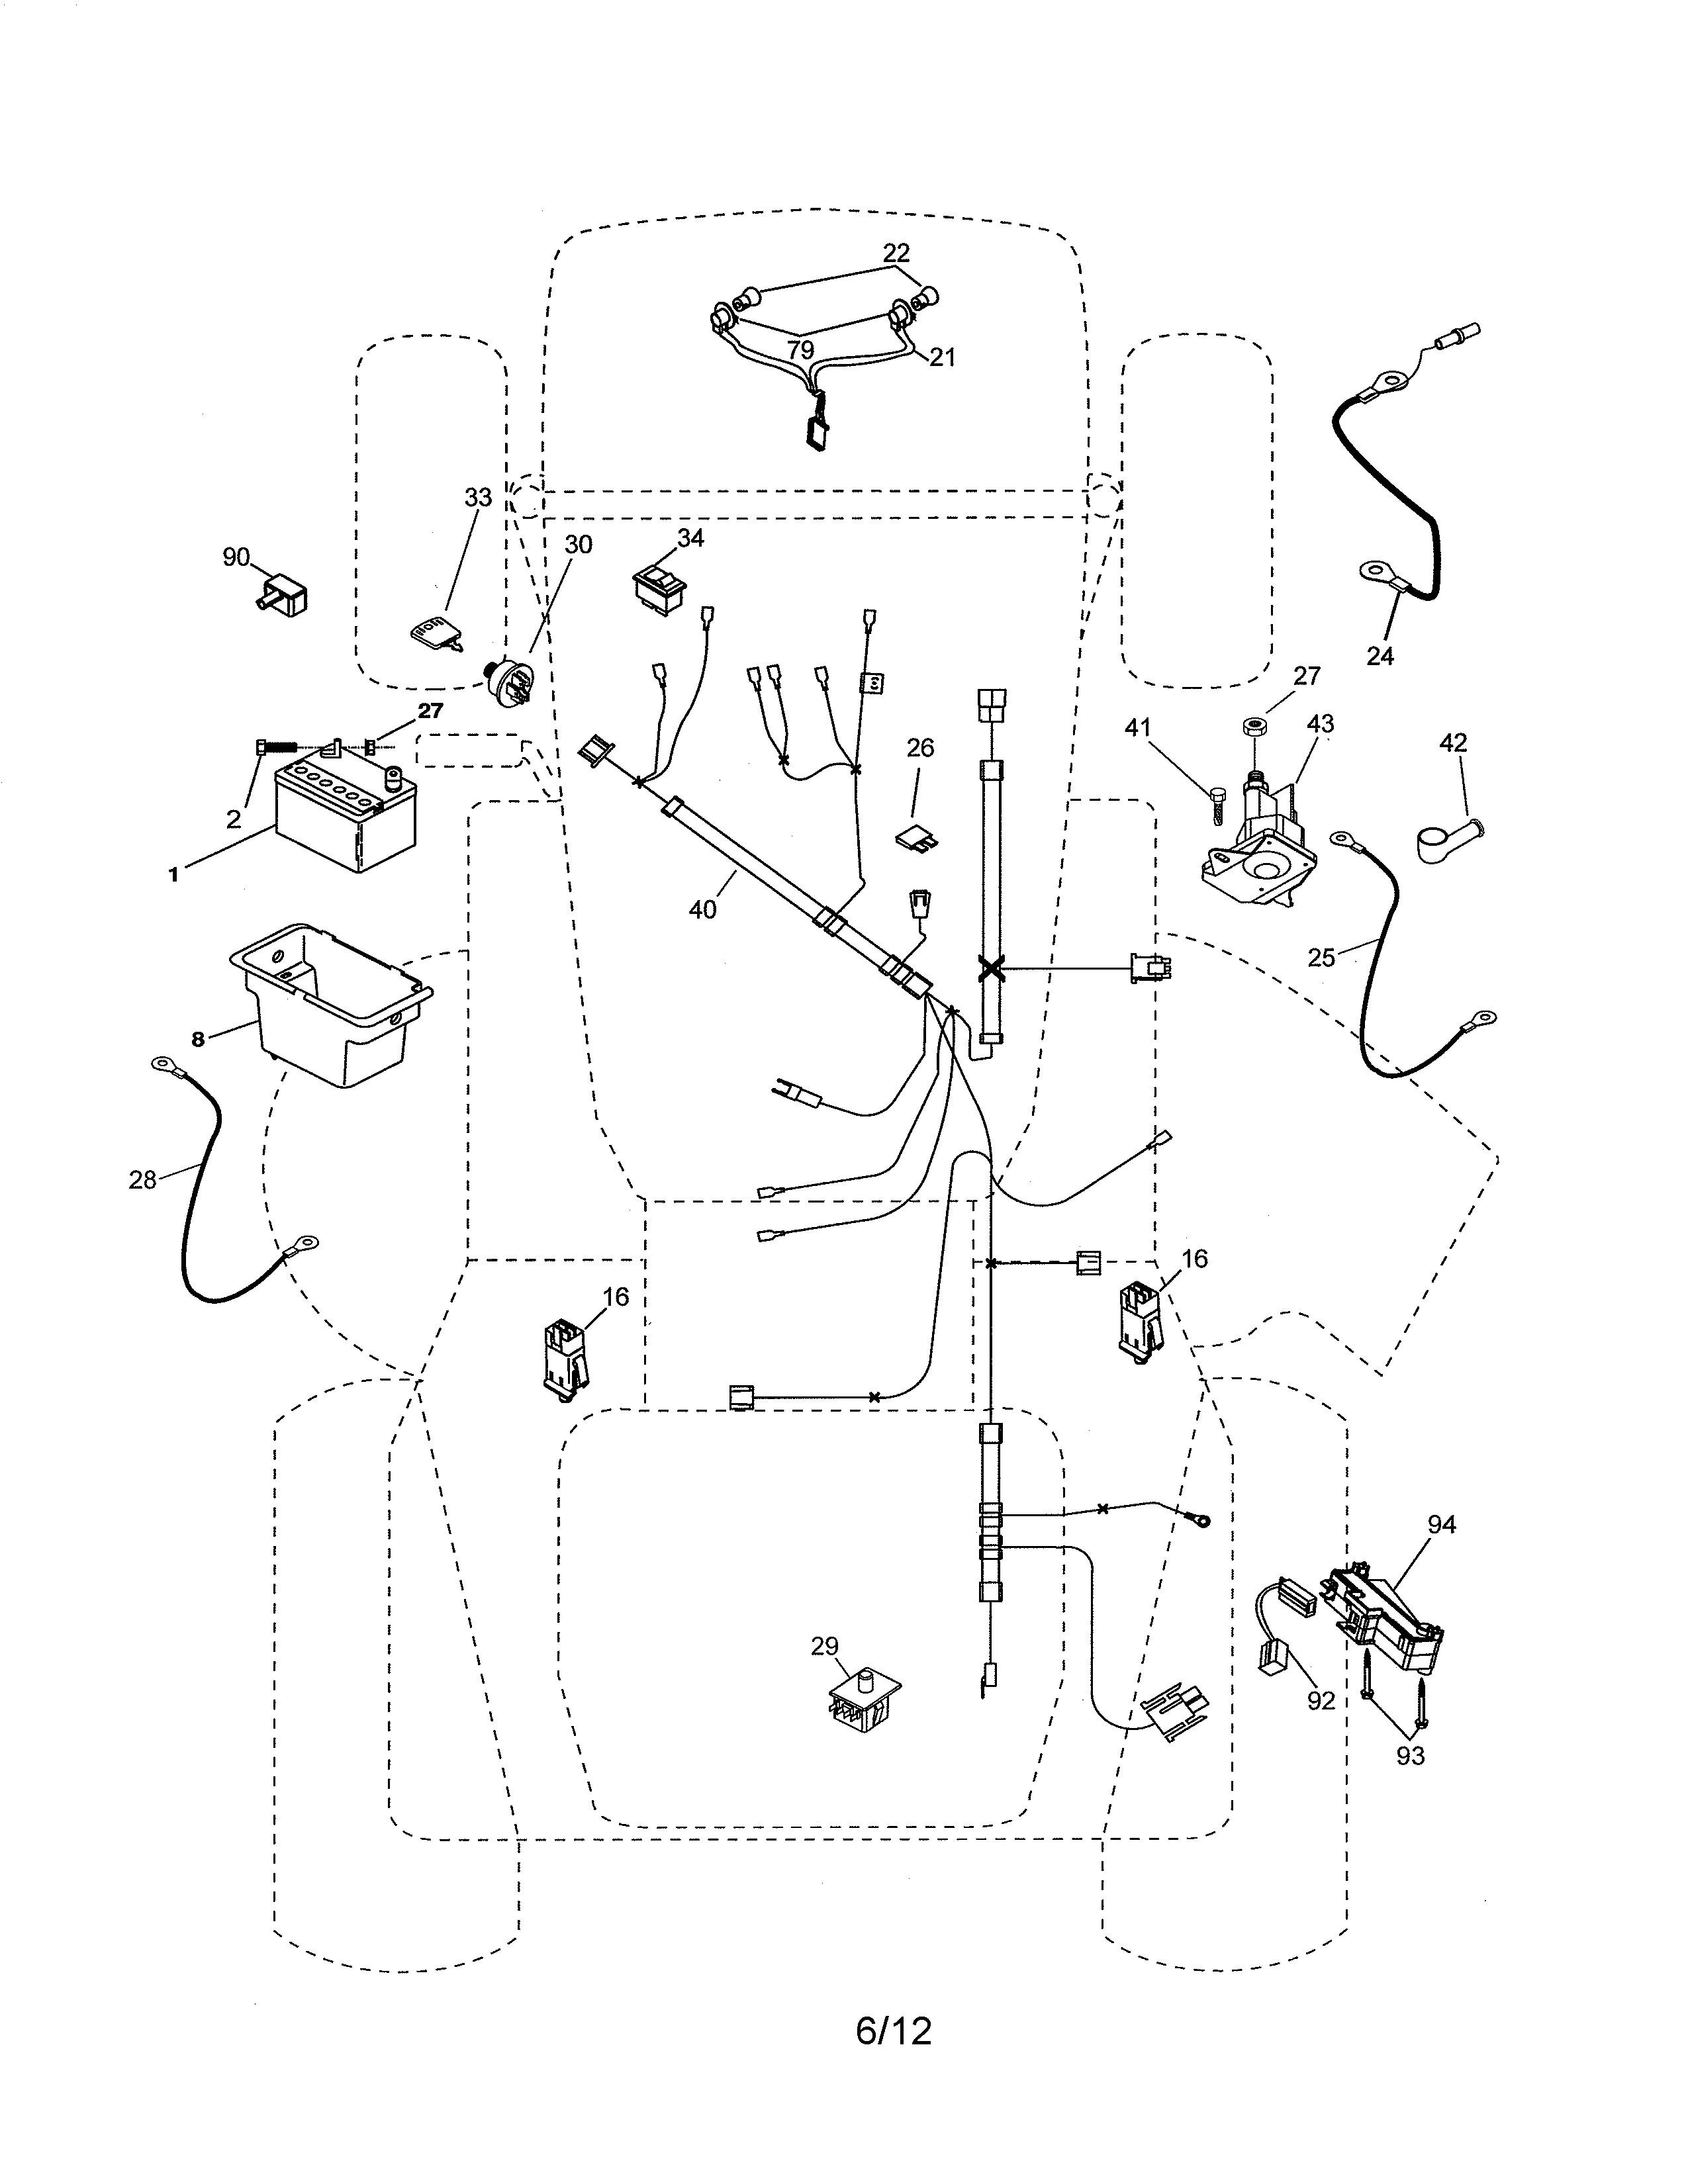 Ariens Lawn Mower Parts Diagram Ariens Model Lawn Tractor Genuine Parts Of Ariens Lawn Mower Parts Diagram